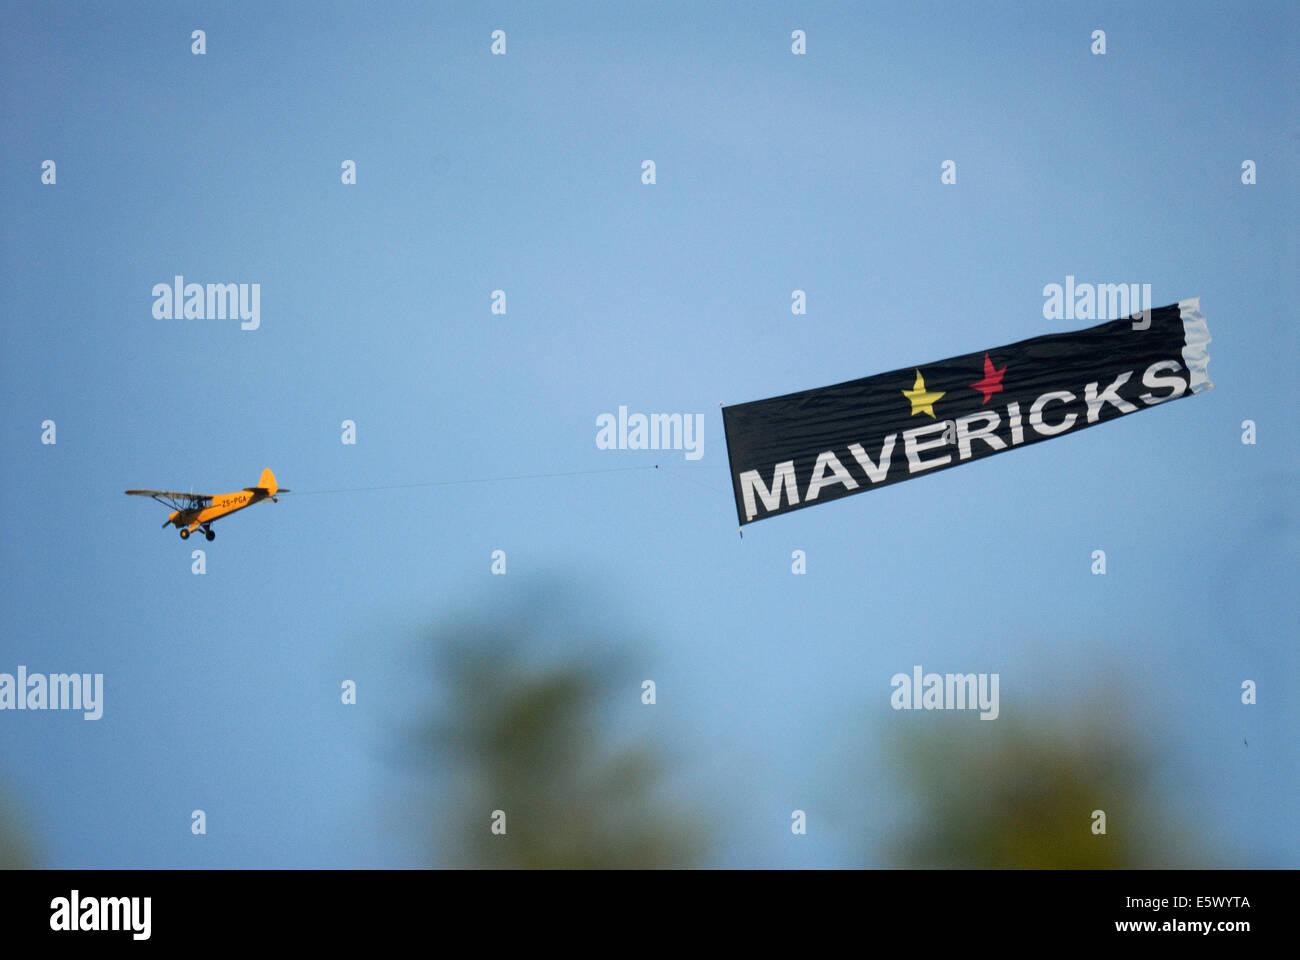 Aerial Advertising - Stock Image